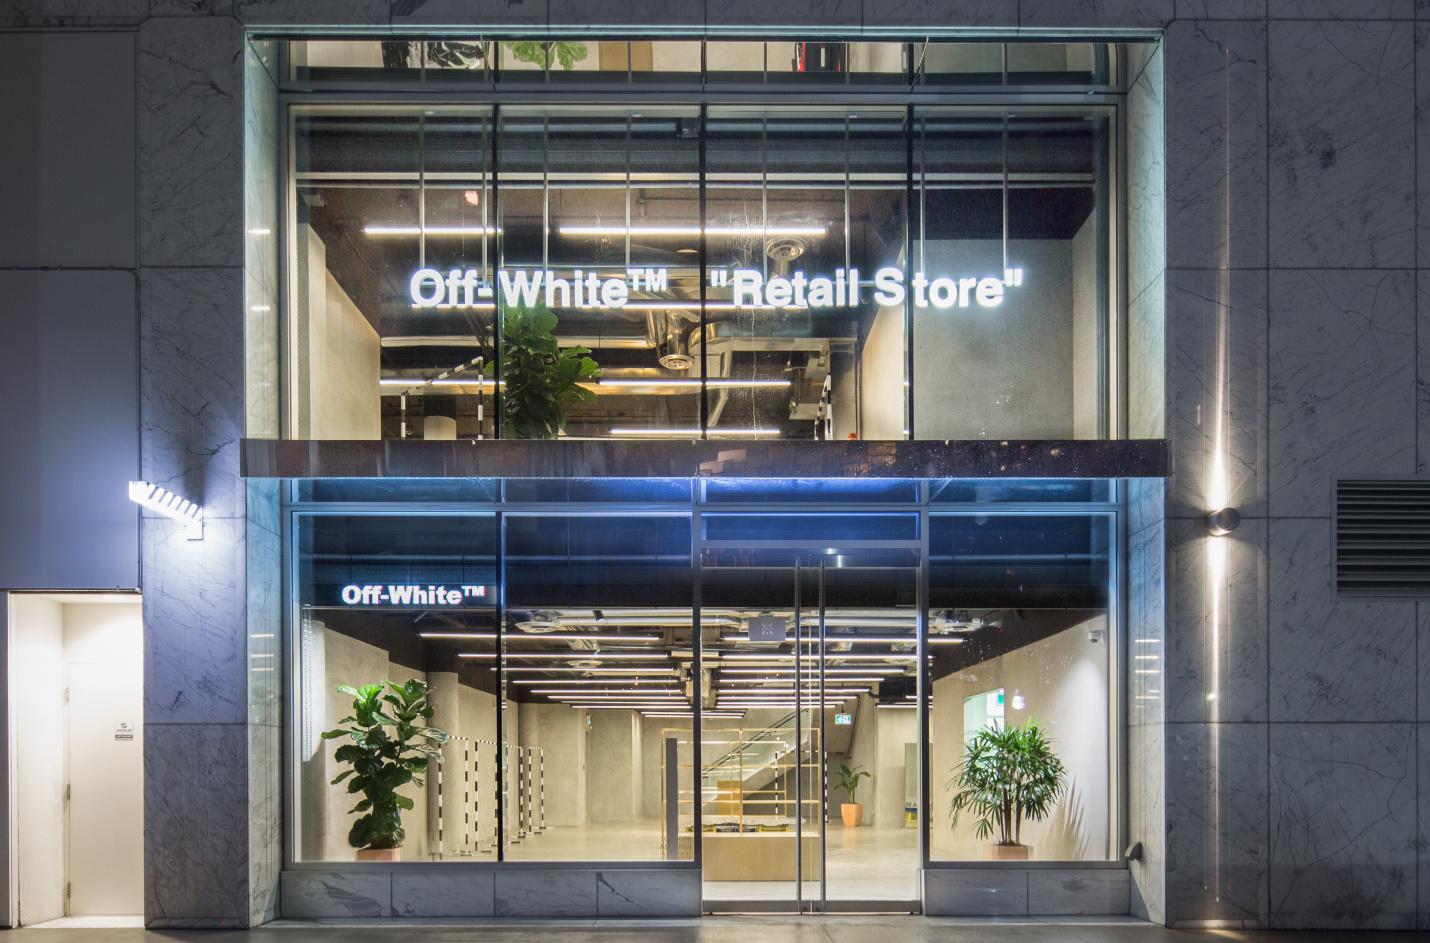 Offwhite store exterior